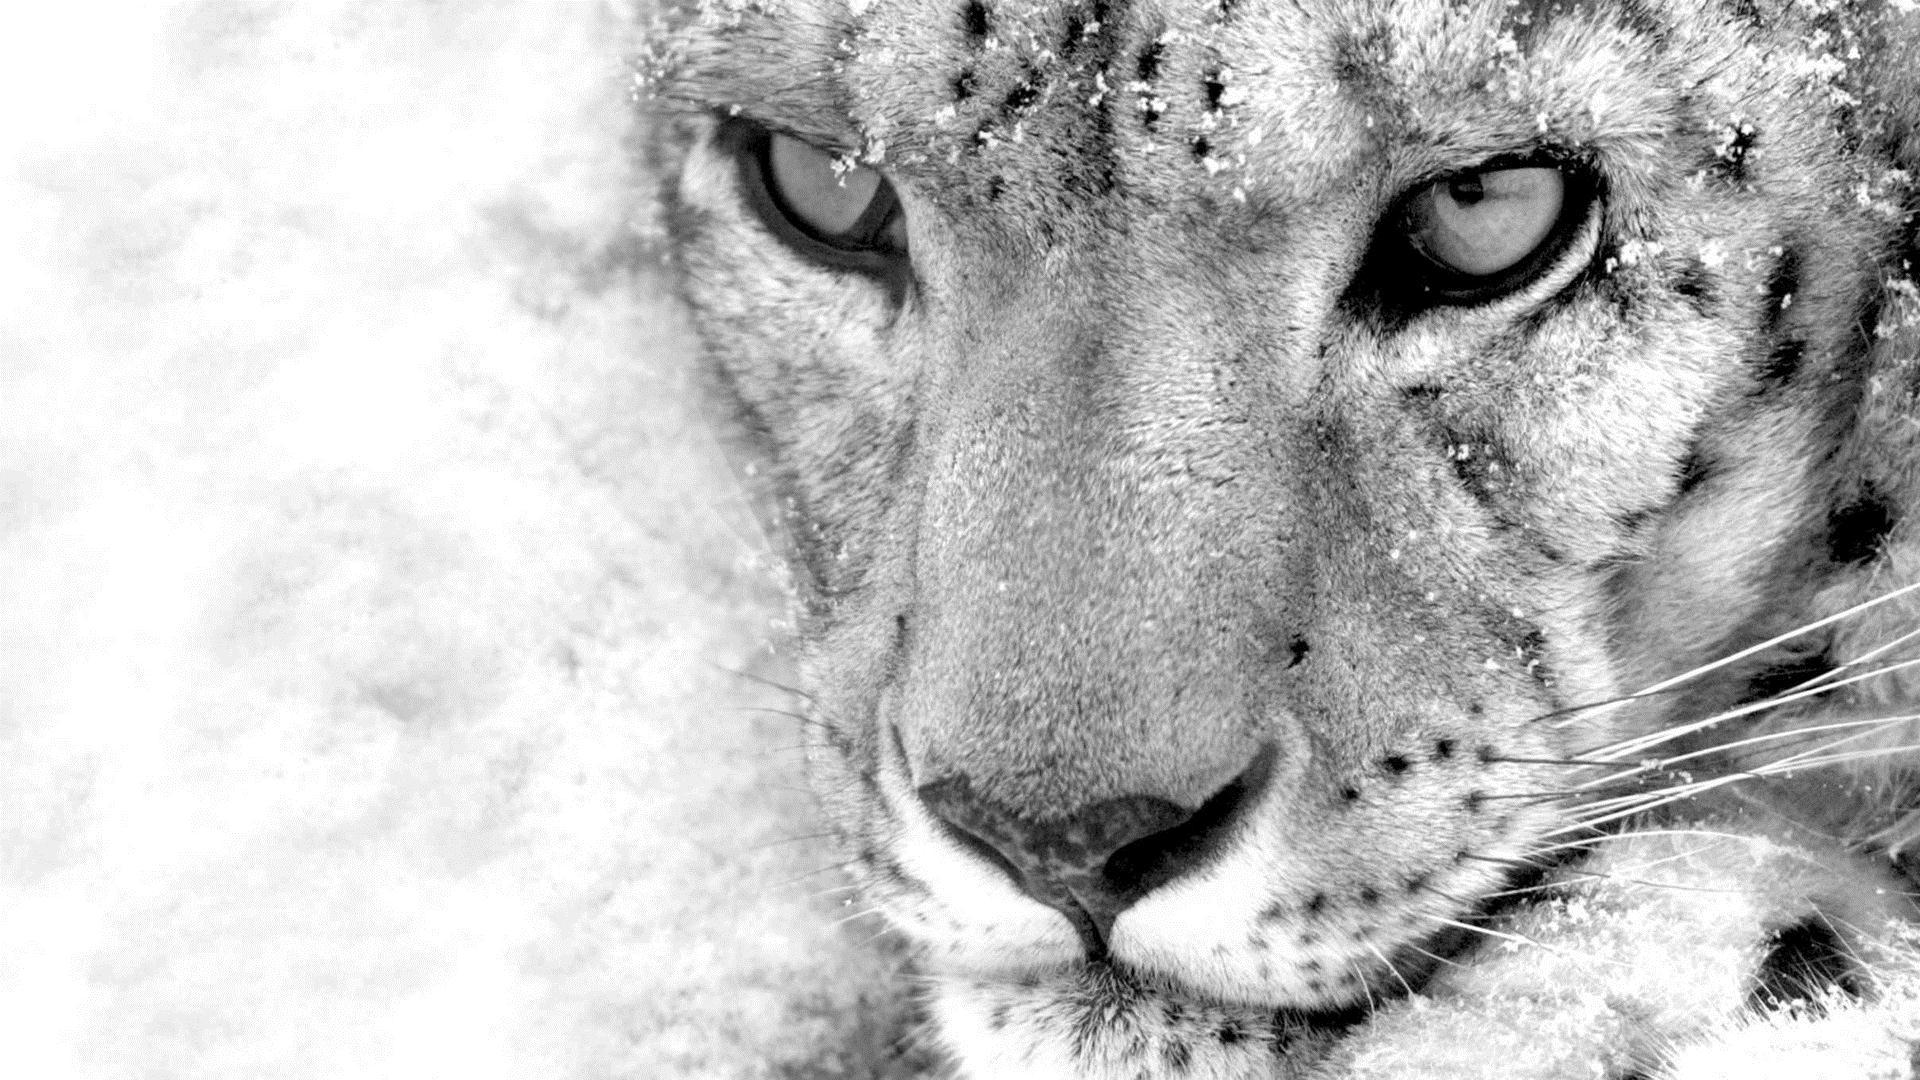 white cheetah wallpaper hd - photo #32